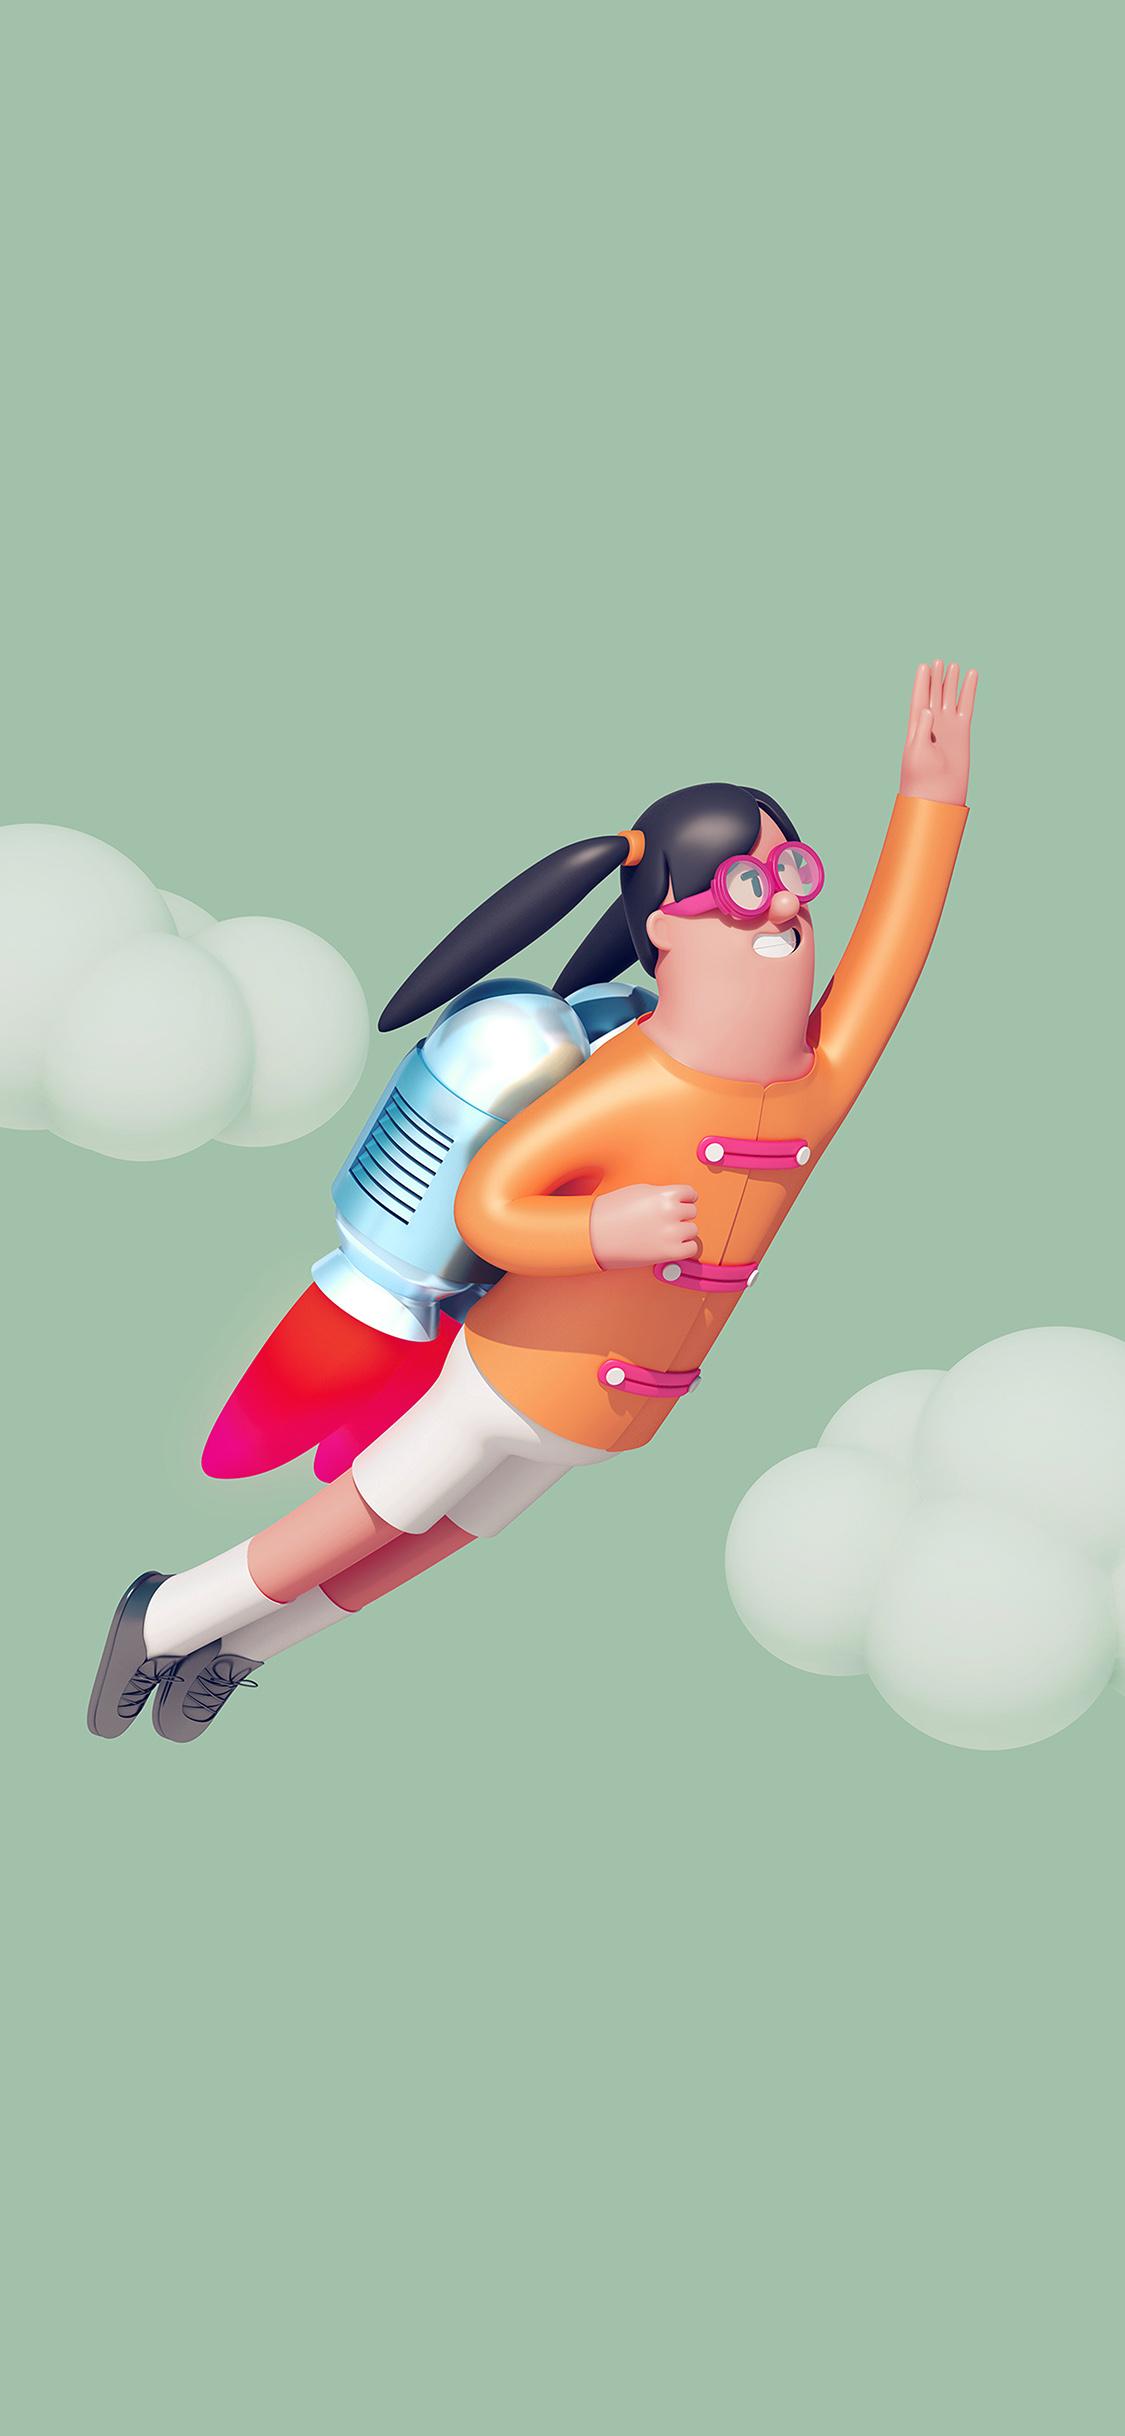 iPhonexpapers.com-Apple-iPhone-wallpaper-az25-girl-fly-3d-illustration-art-cute